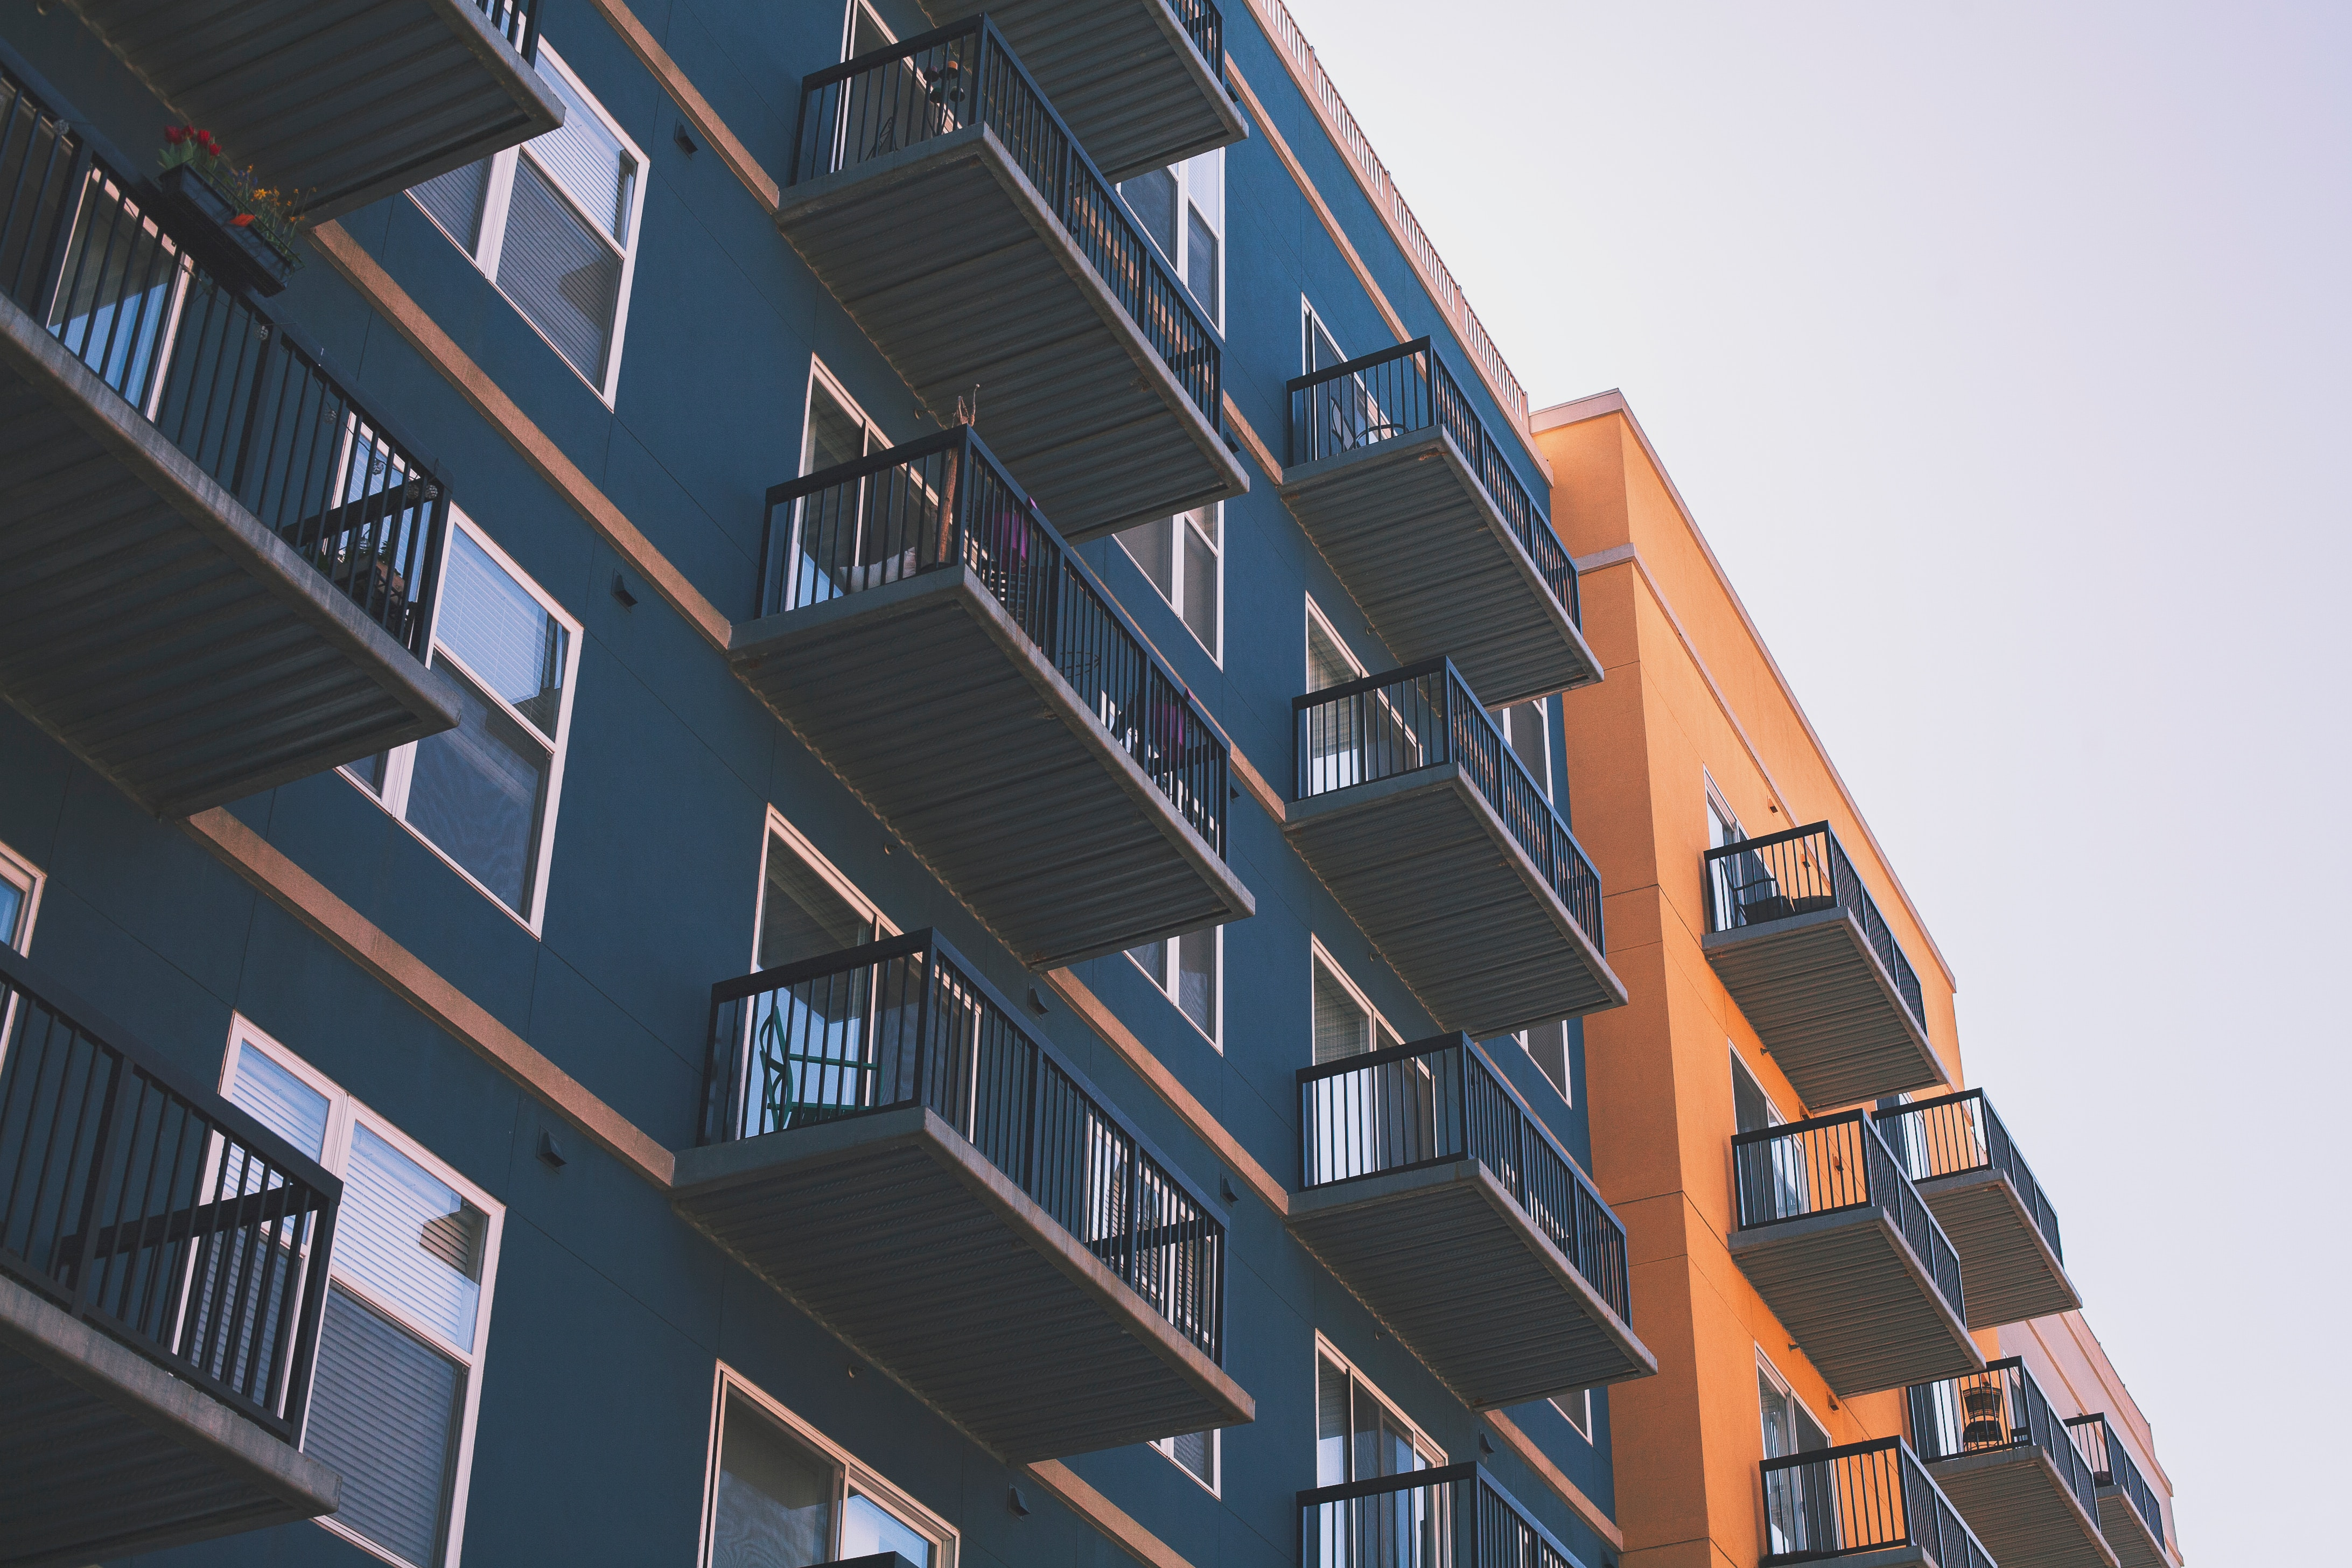 facade d'immeuble appartement à louer